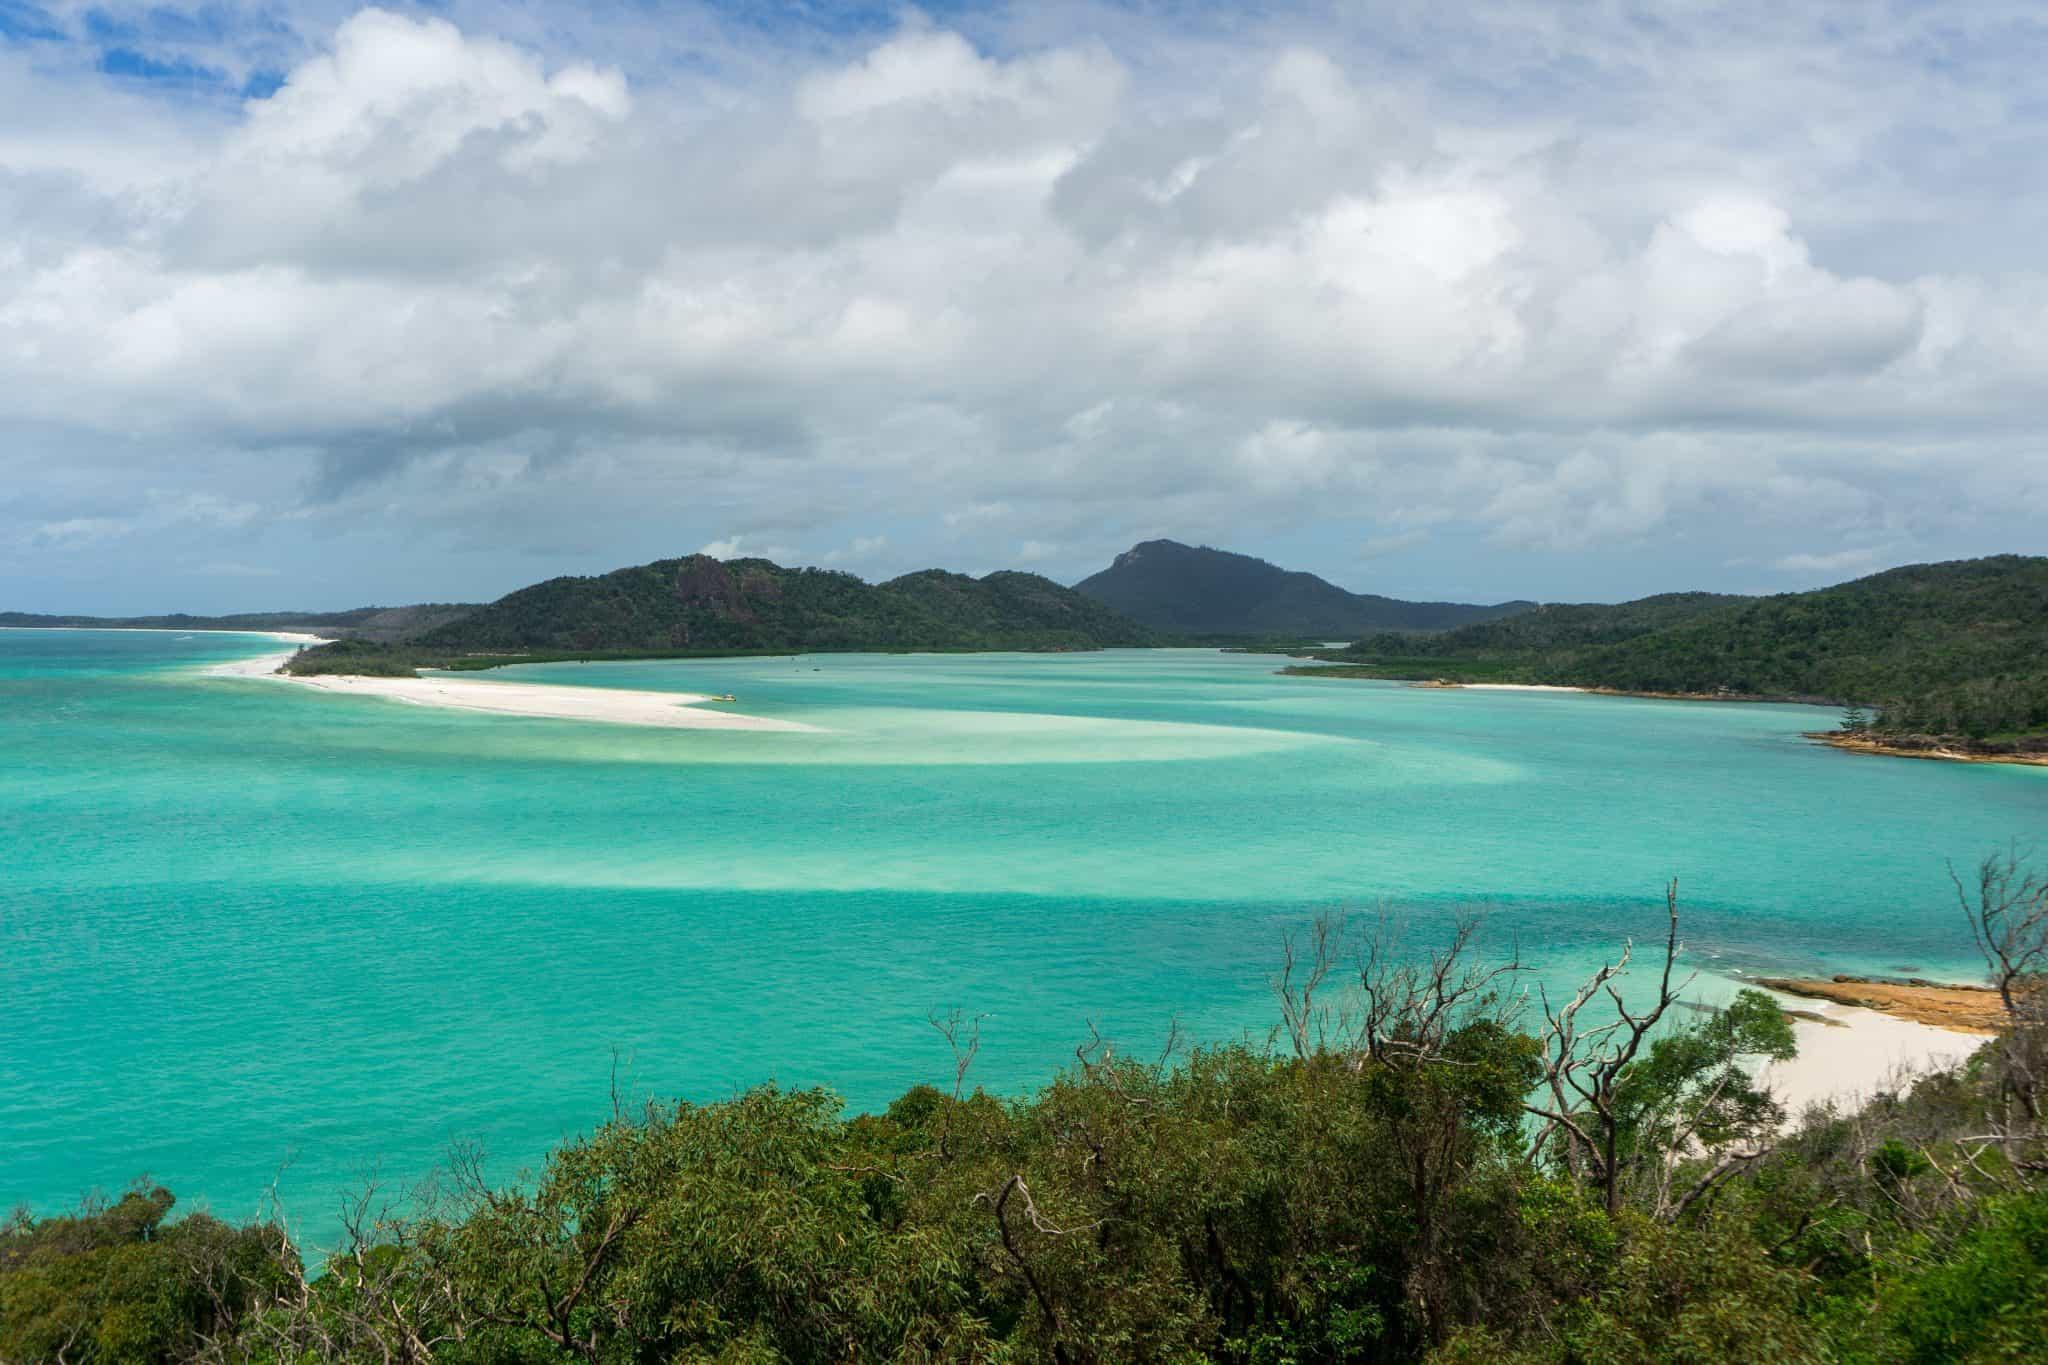 beach - Australia travel bucketlist